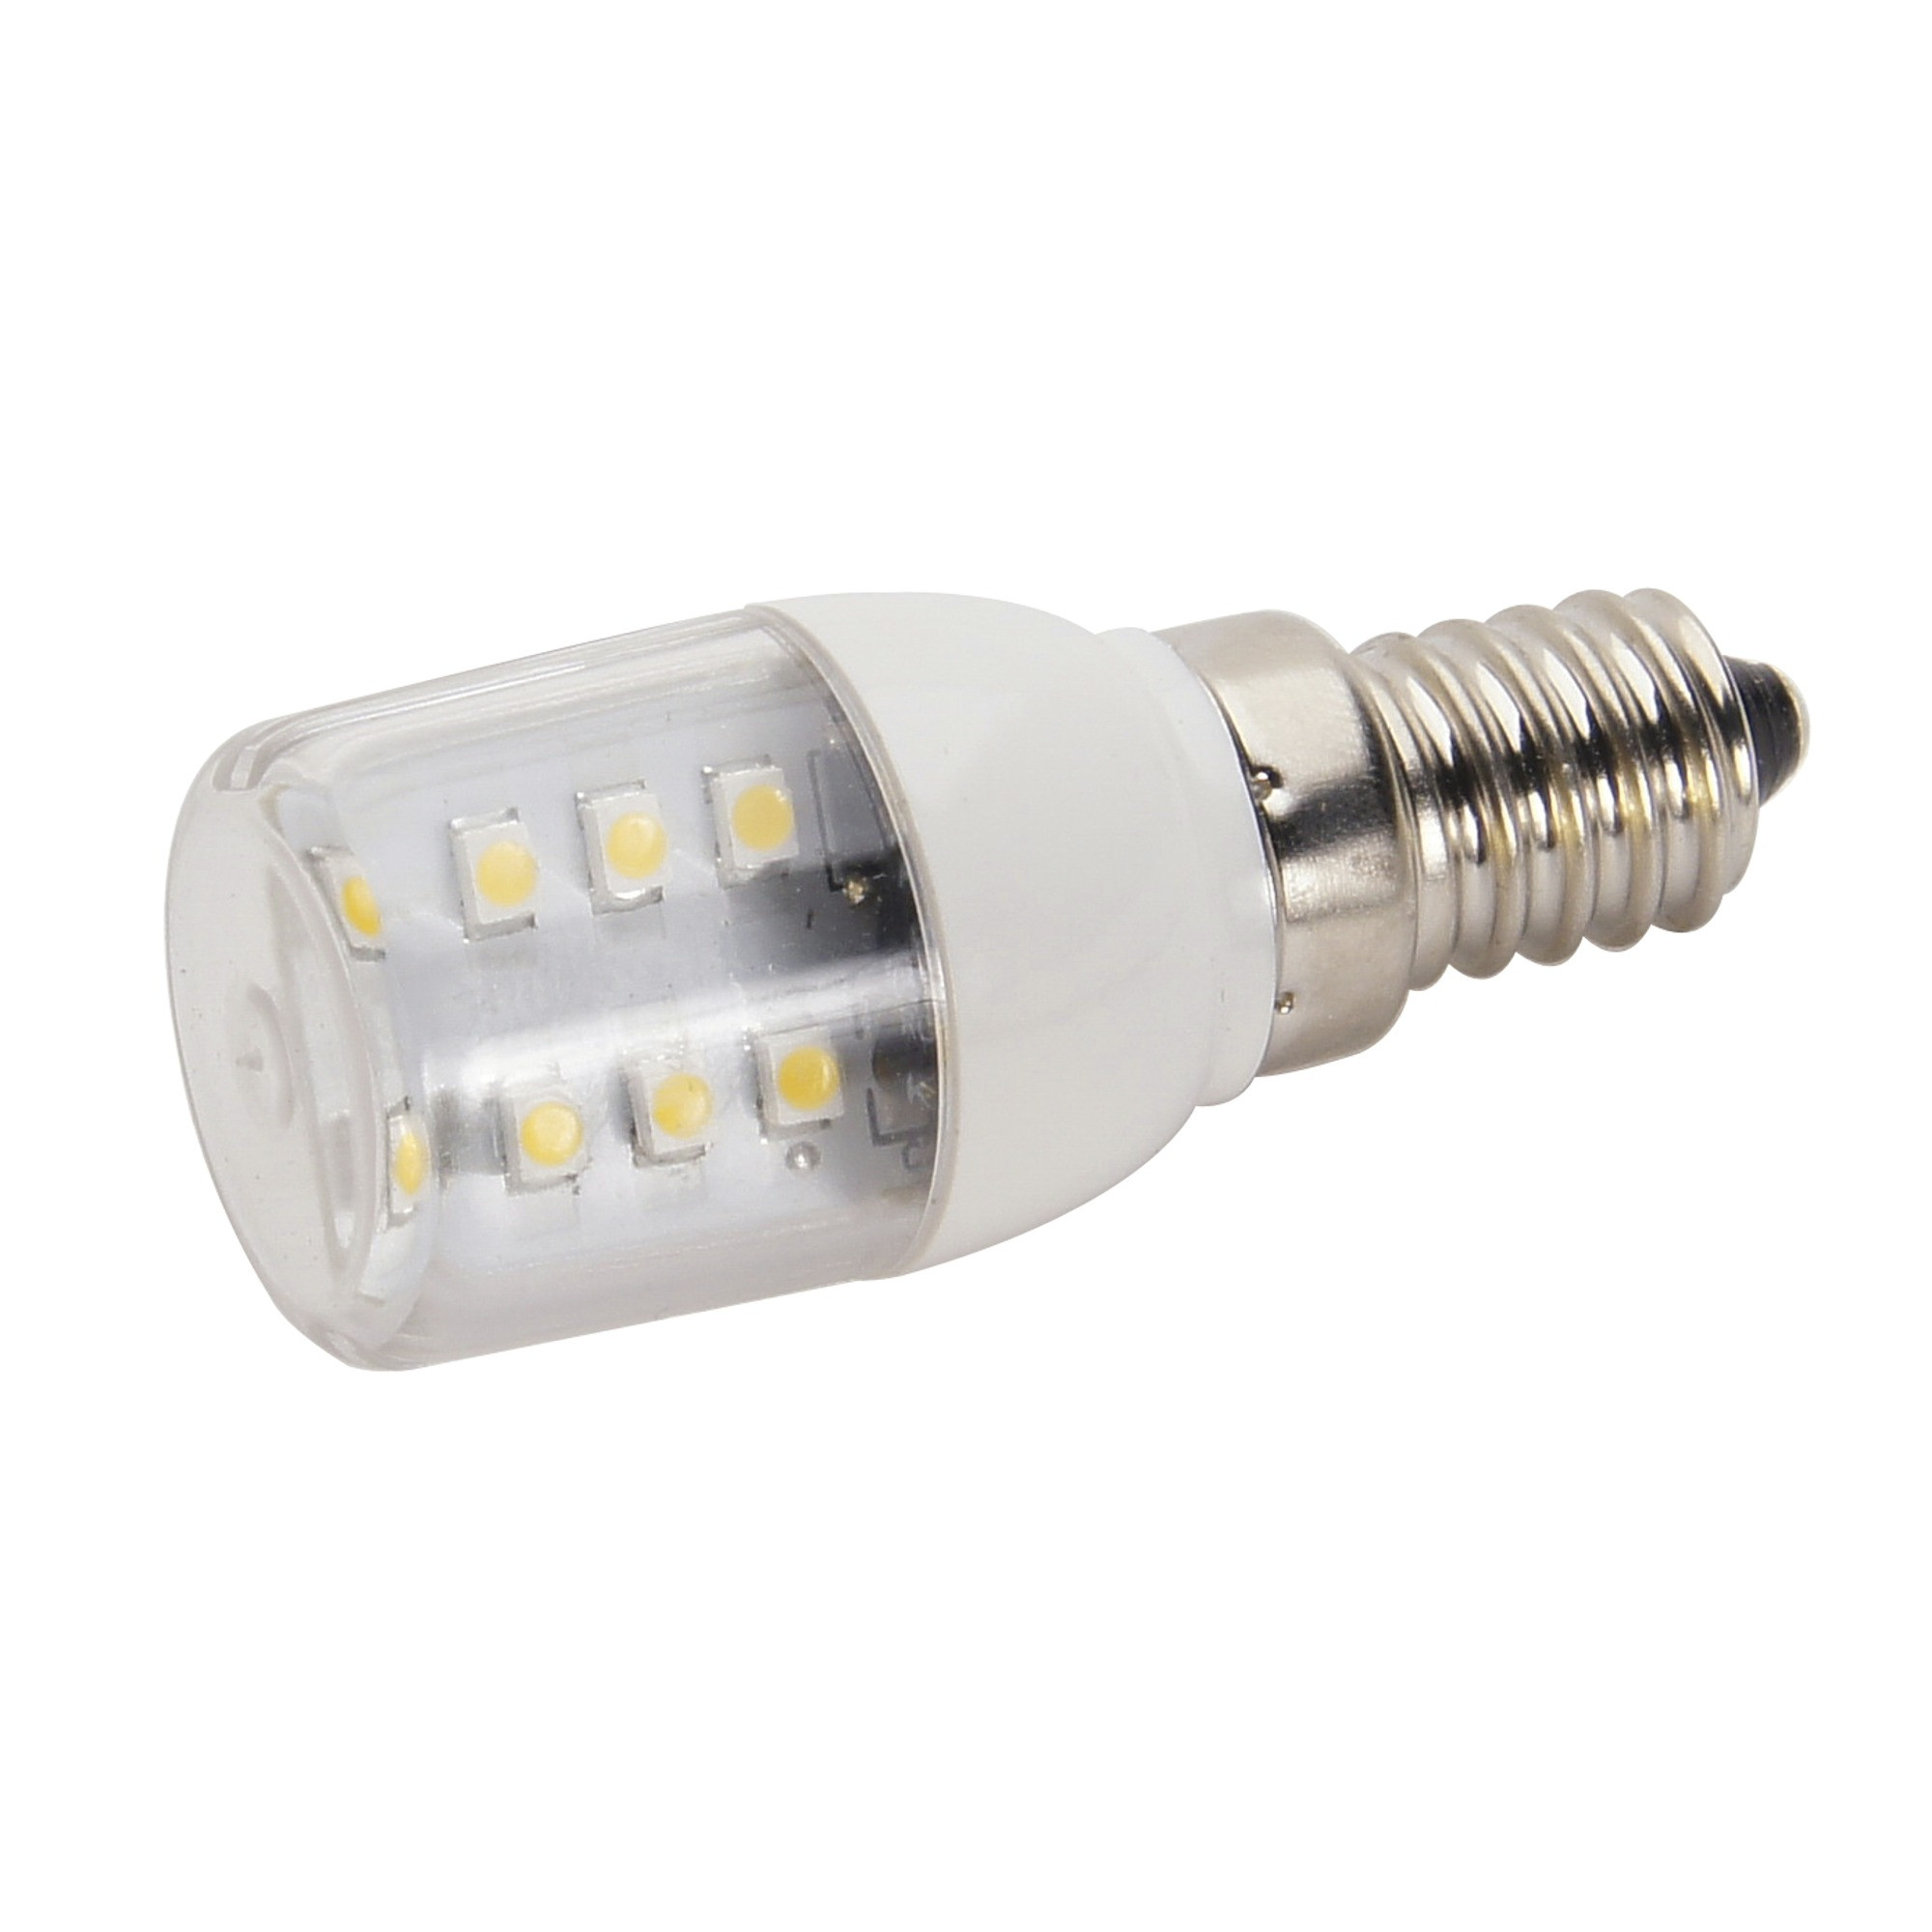 Led Lampen E14  Prolight LED koelkastlamp E14 2W LED lampen